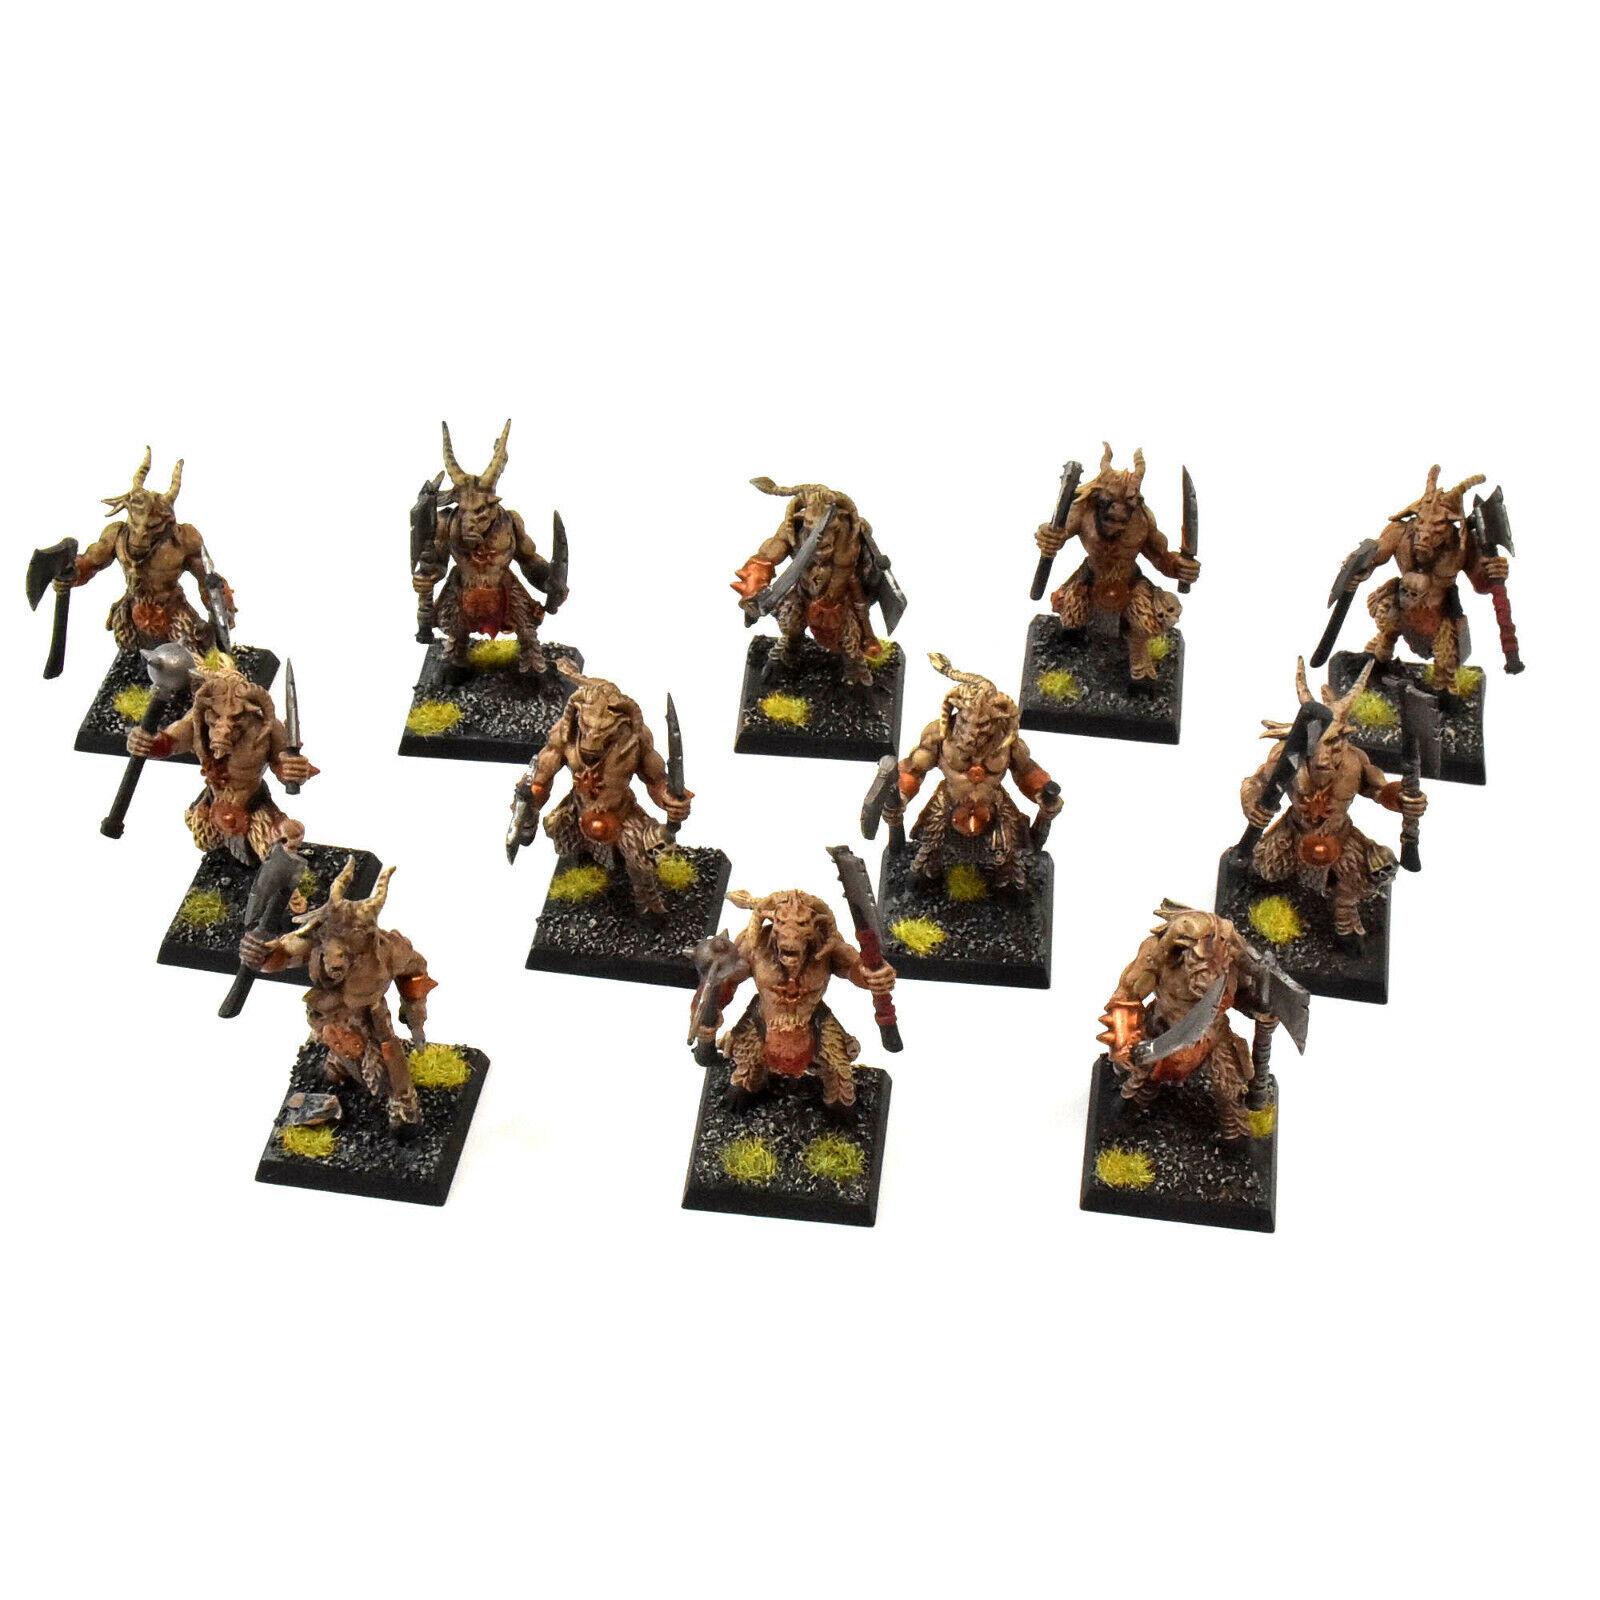 SPIAGGI DI CHAOS 12 Gors  2 WELL PAINTED Warhammer fantasyc Beastmen Gor